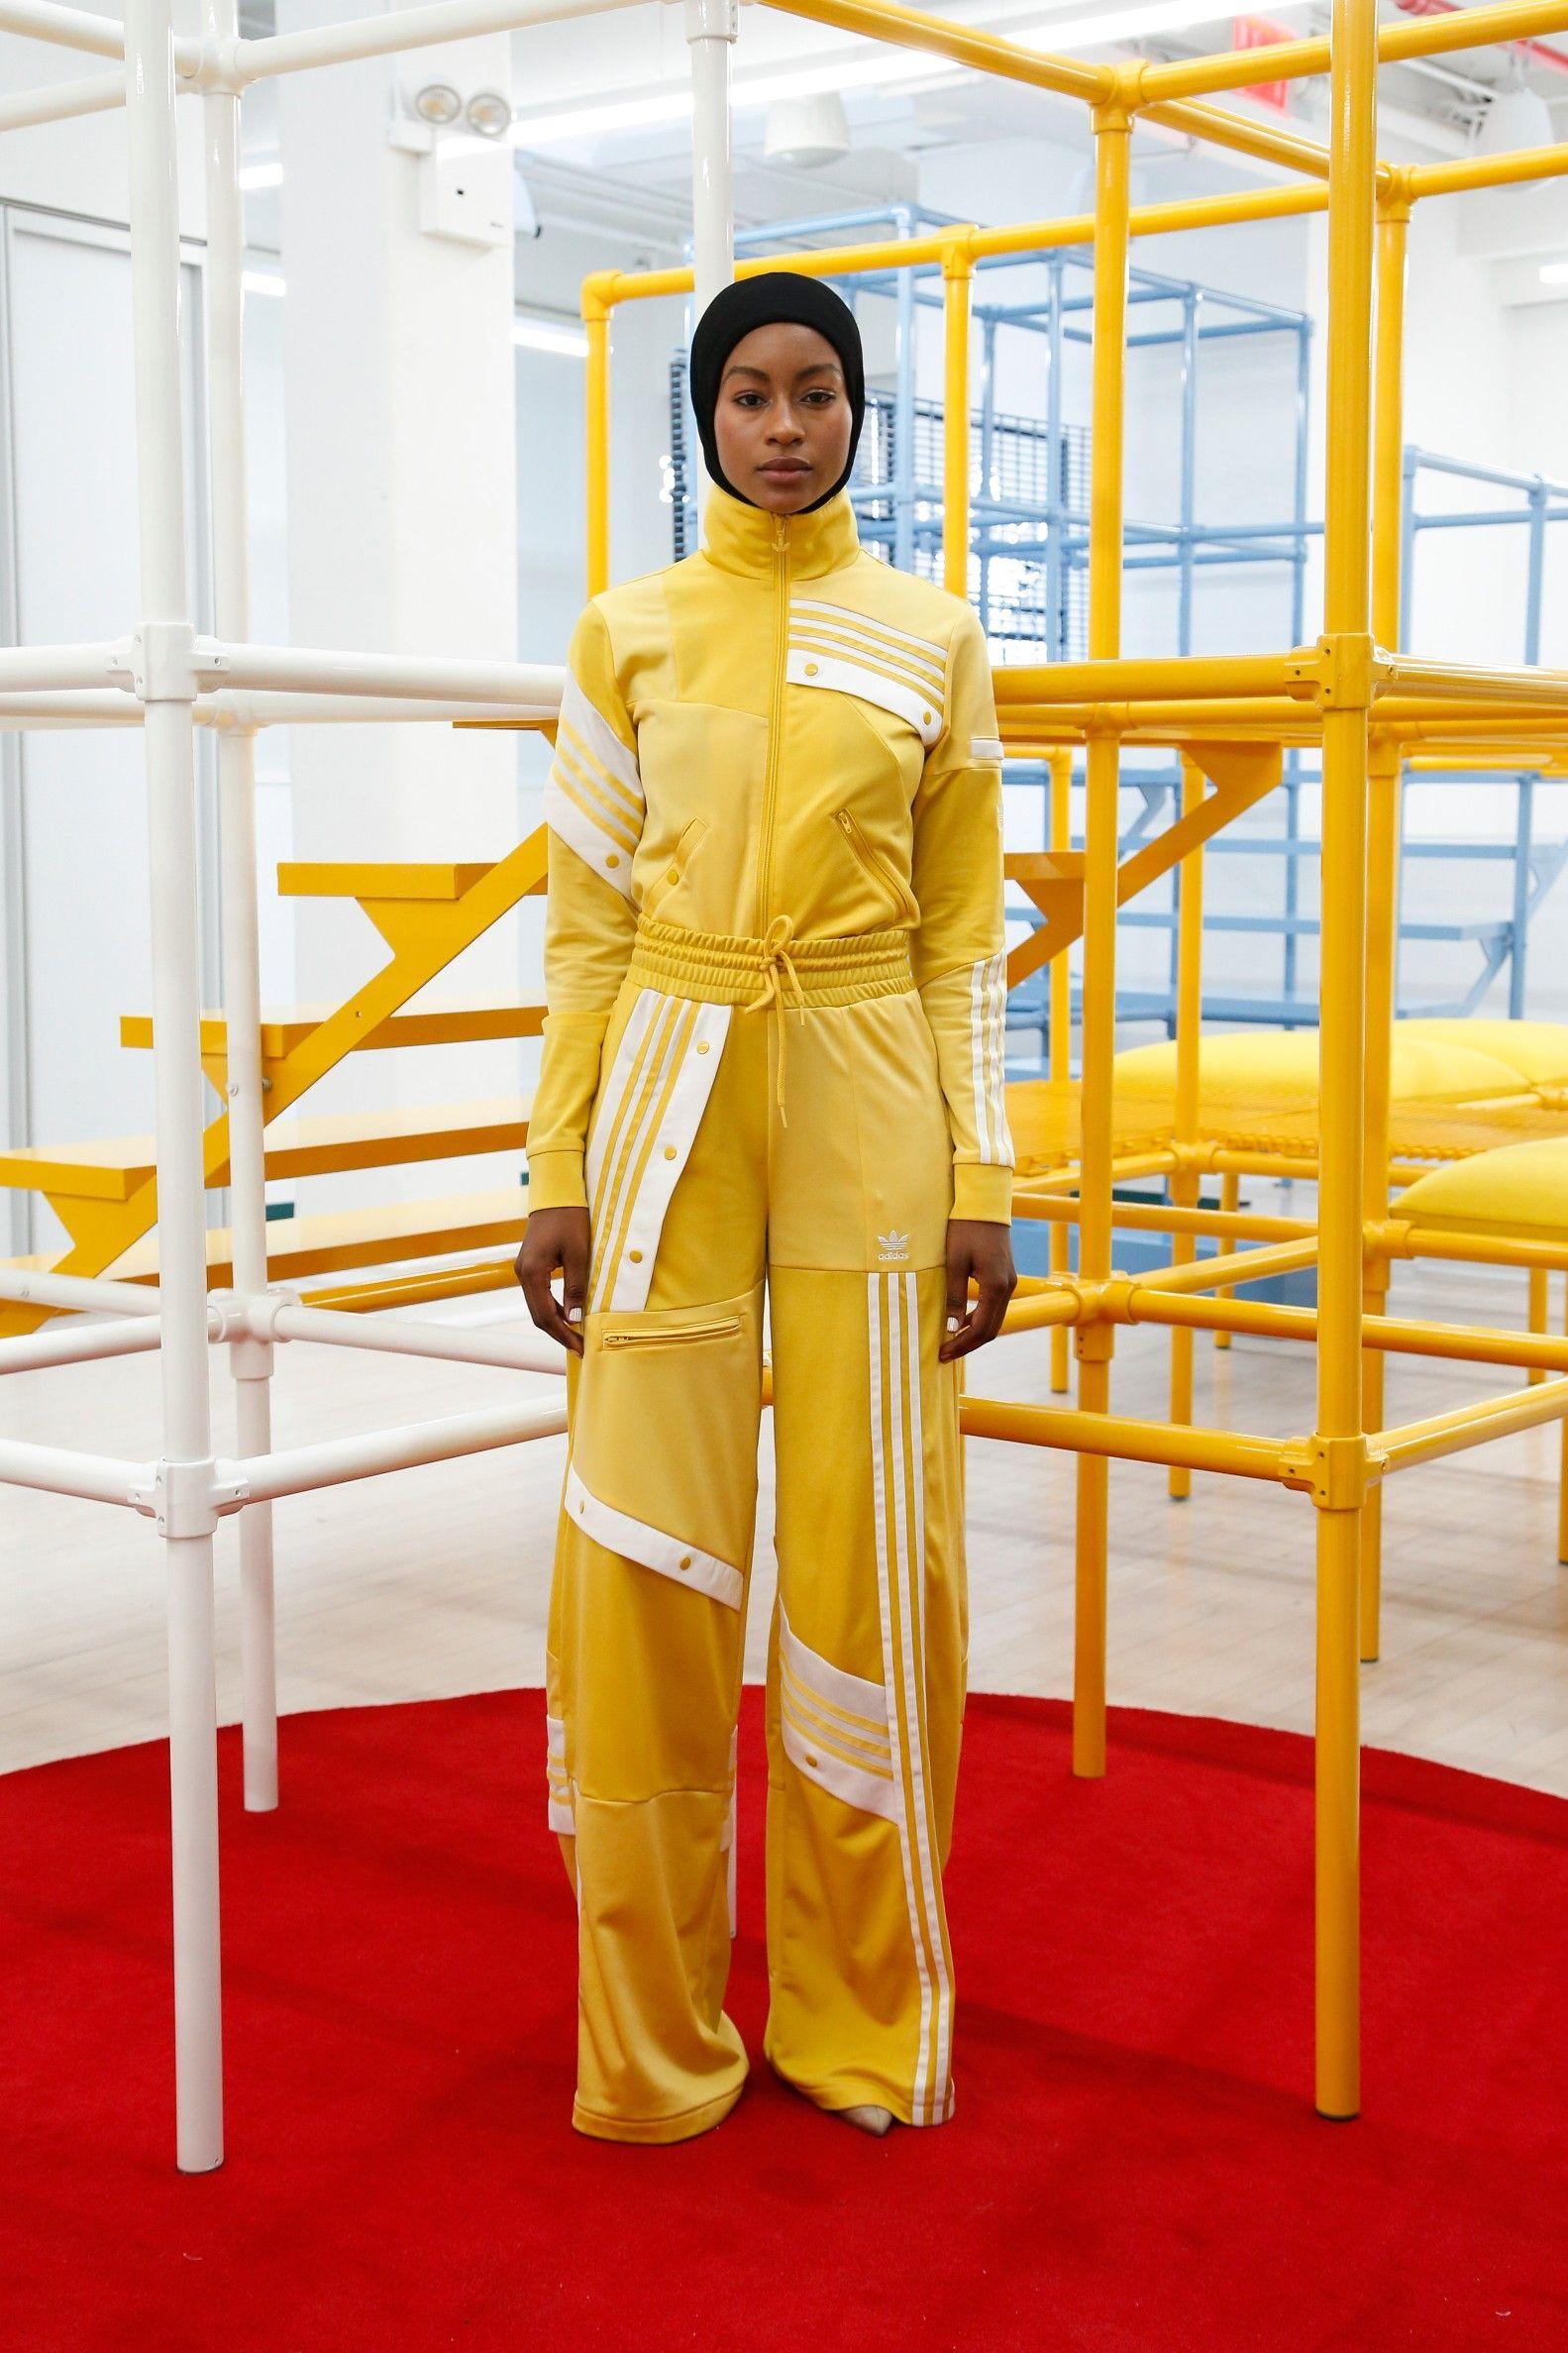 e489af8e68 Adidas Originals x Danielle Cathari Collaboration Debut   NYFW – PAUSE  Online